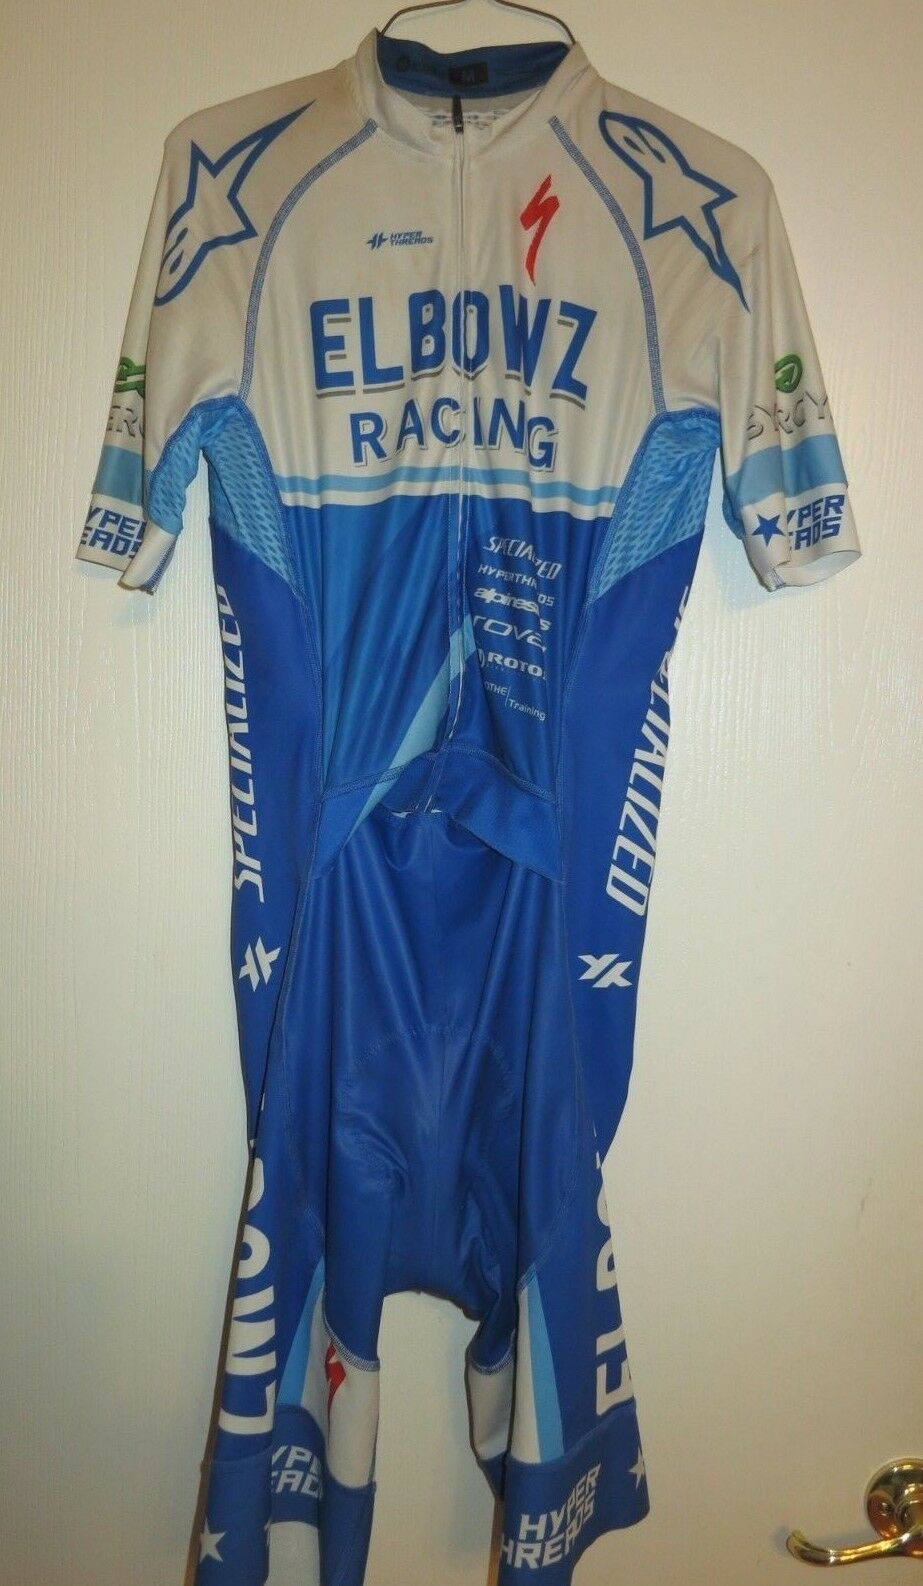 18 HYPERTHREADS ELBOWZ Racing Cycling Team San Remo Short Sleeve Skinsuit Medium